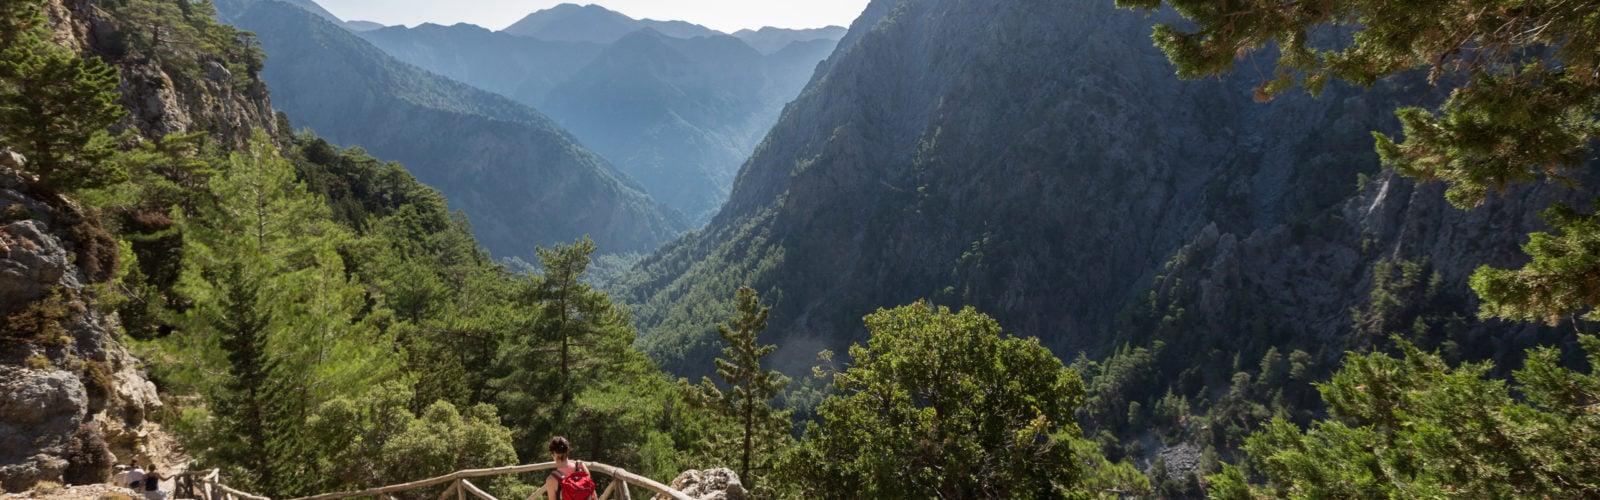 samaria-gorge-stairs